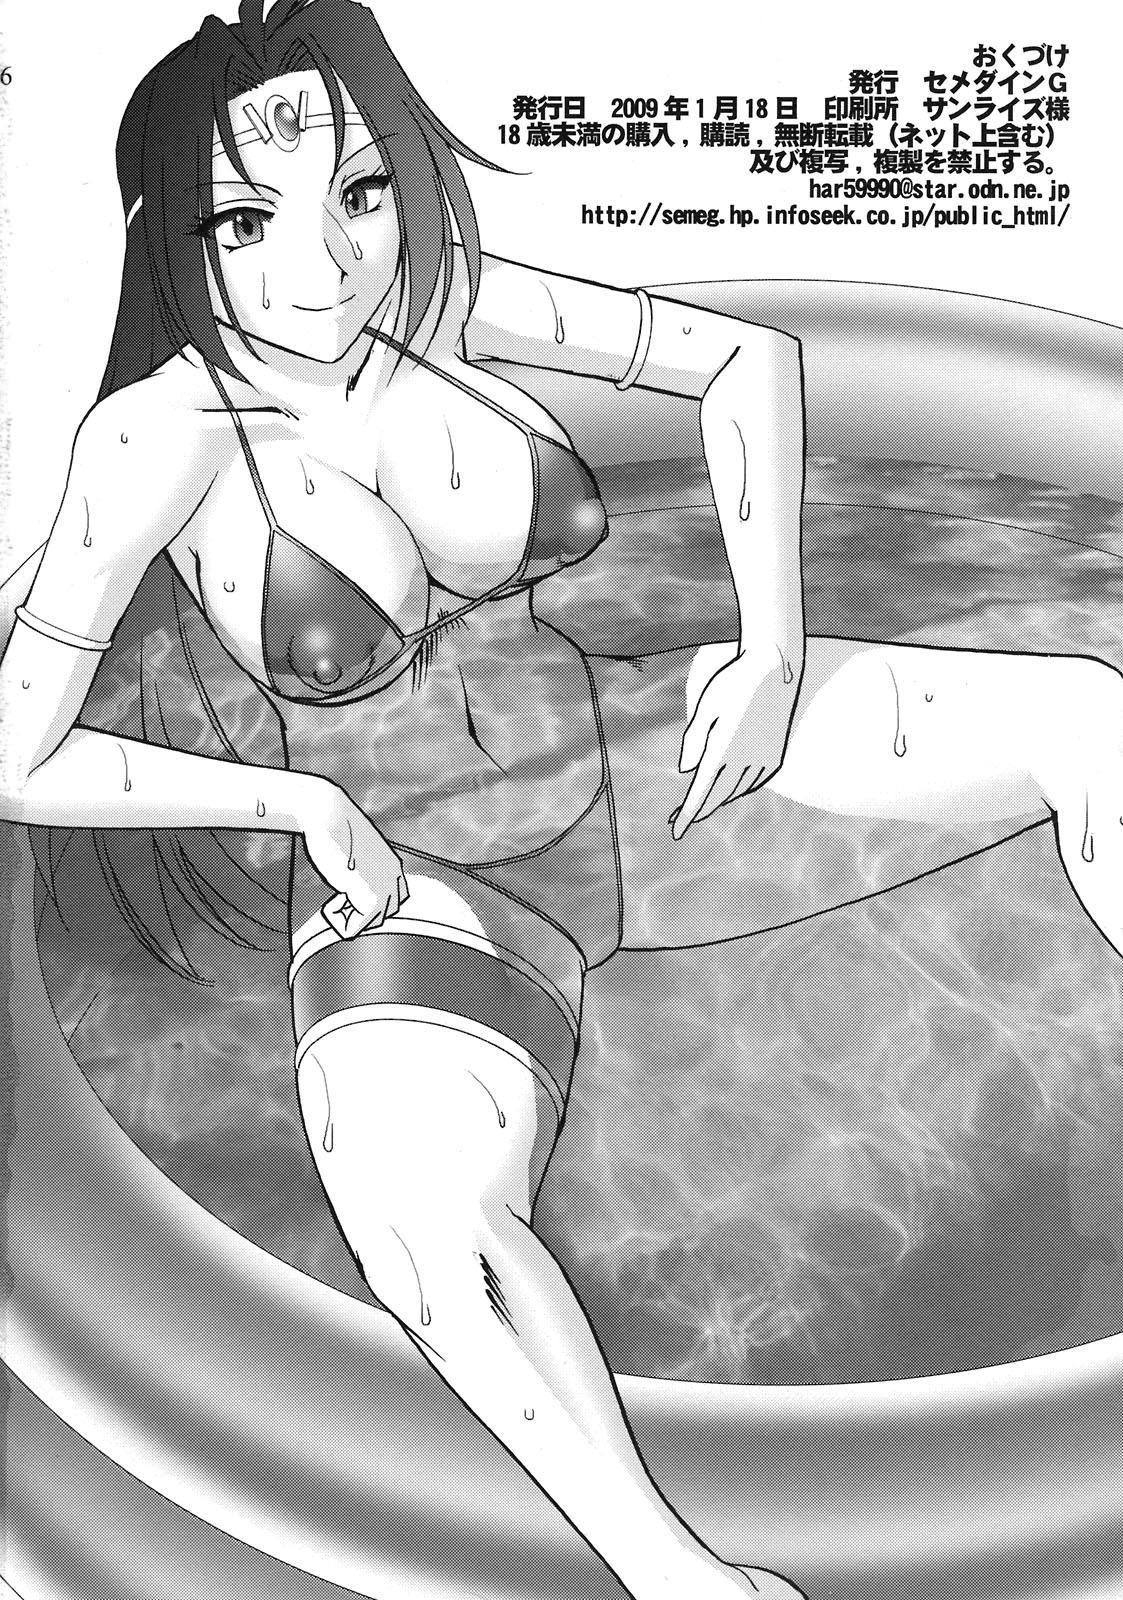 SEMEDAIN G WORKS vol.35 - Shirohebi Ryuu Mata 25